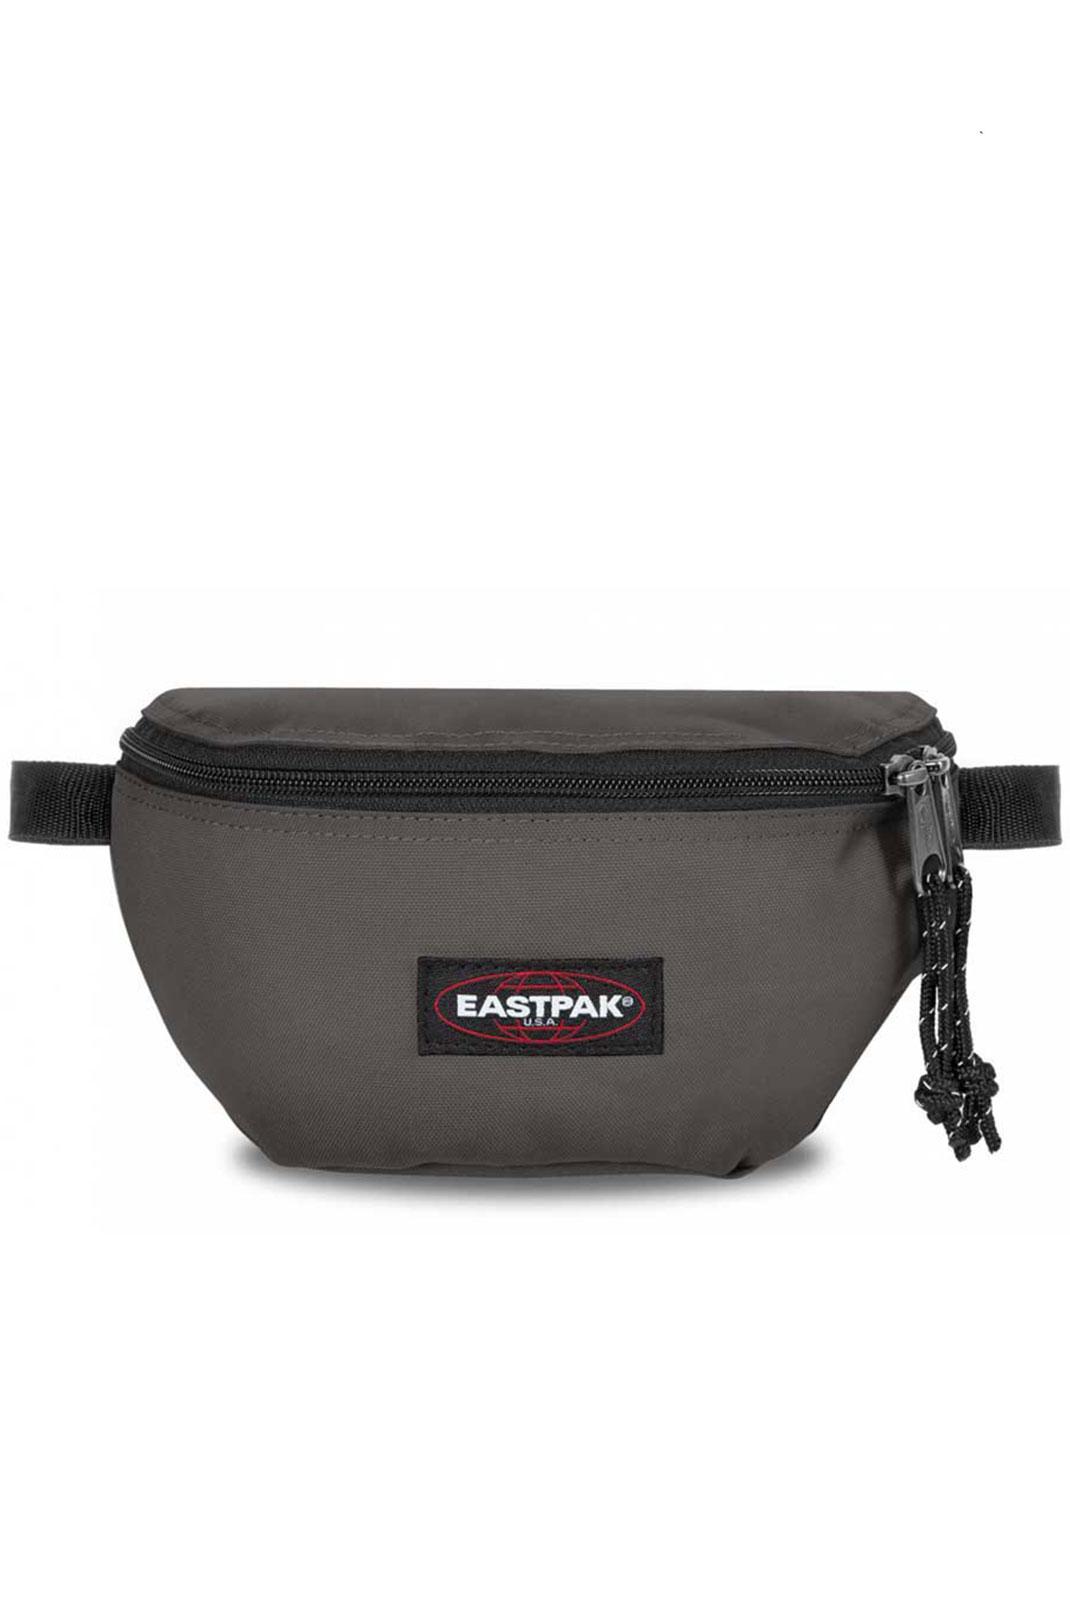 Sac porté épaule  Eastpak EK07483Z  gris